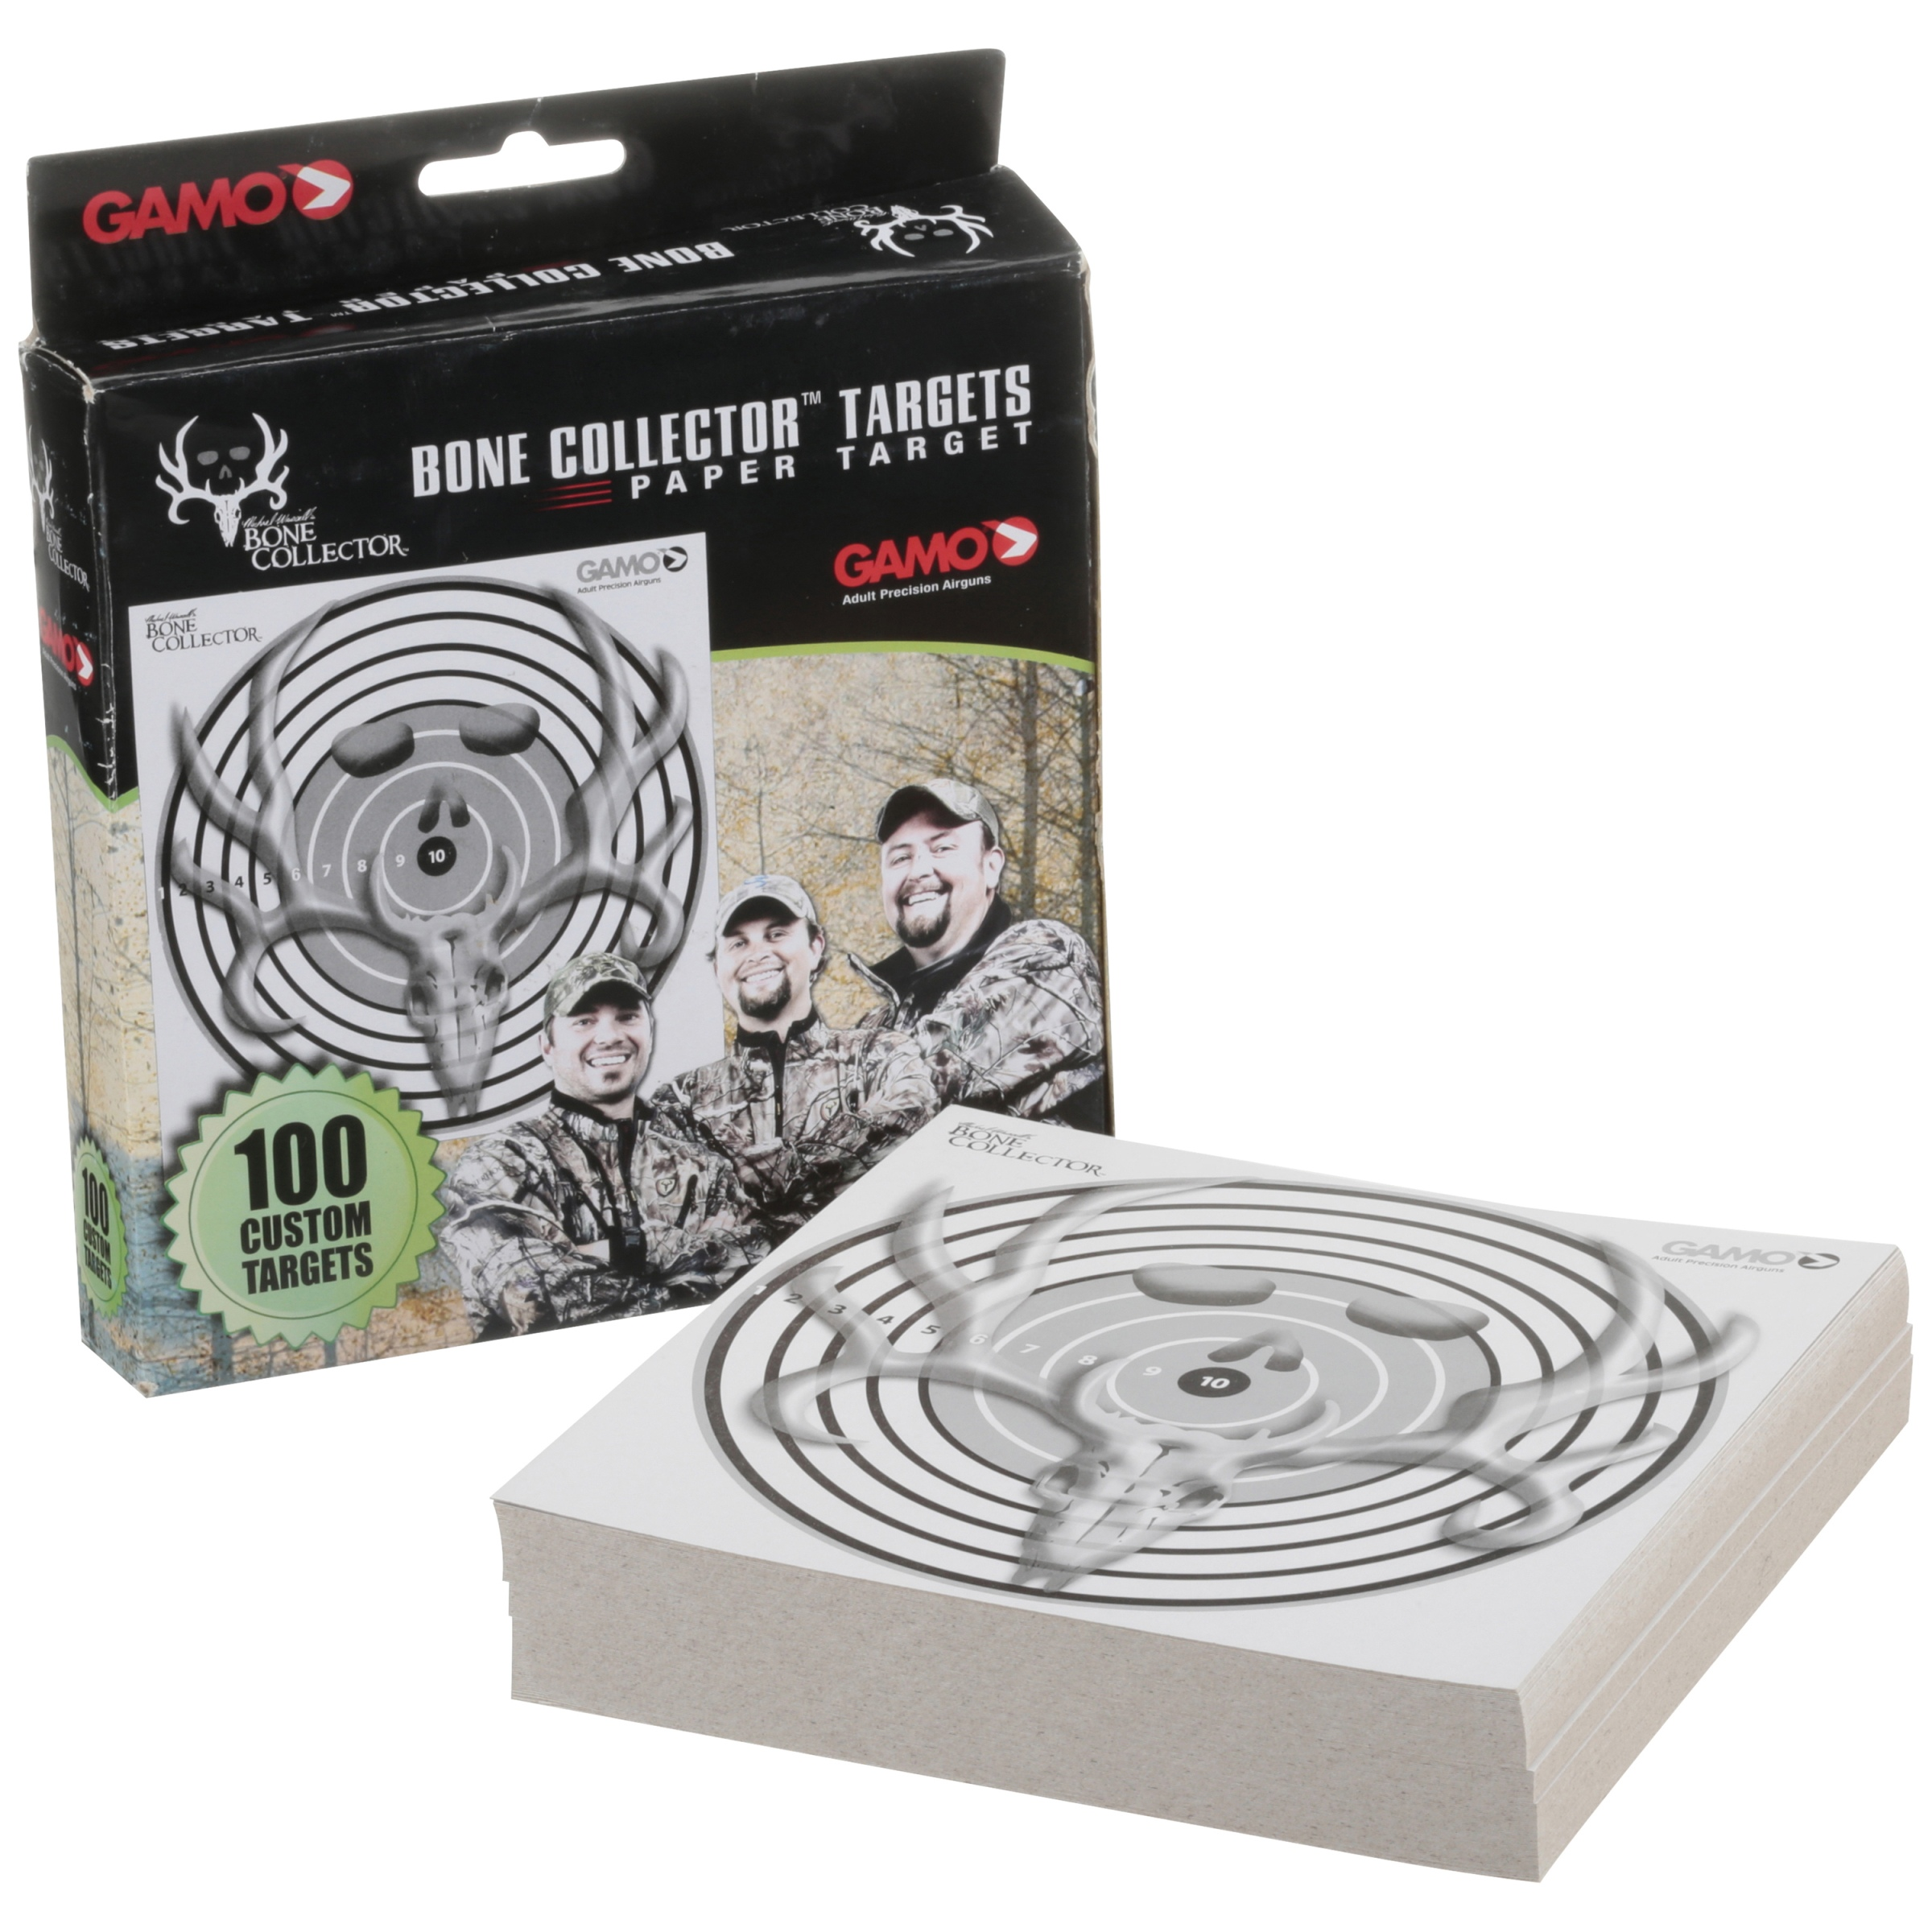 Gamo Bone Collector Paper Targets 100 ct Box by Gamo Outdoor USA Inc.